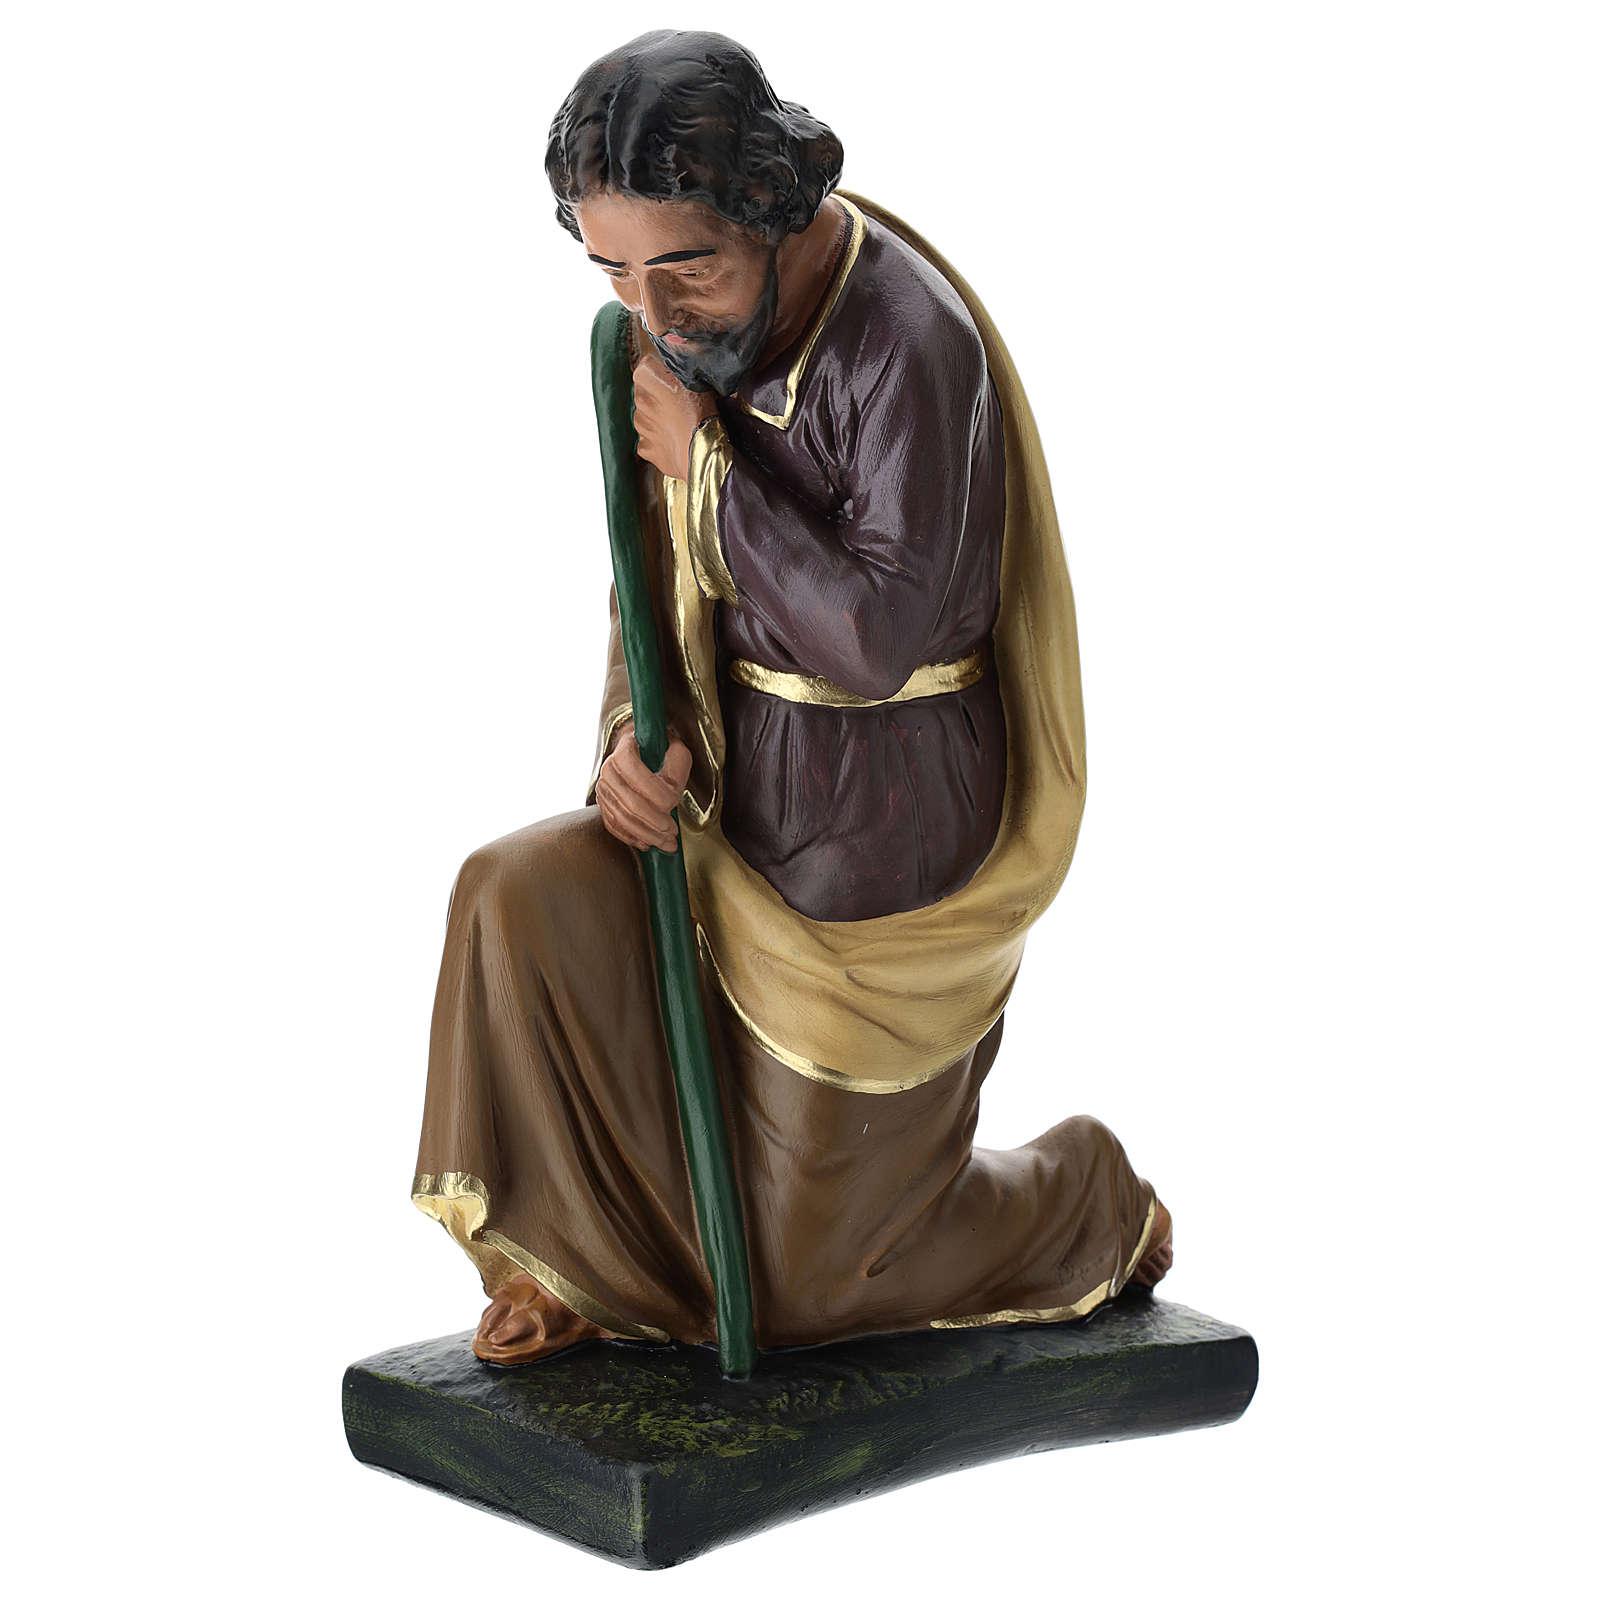 Tríada Arte Barsanti estatuas Natividad yeso pintado a mano 40 cm 4